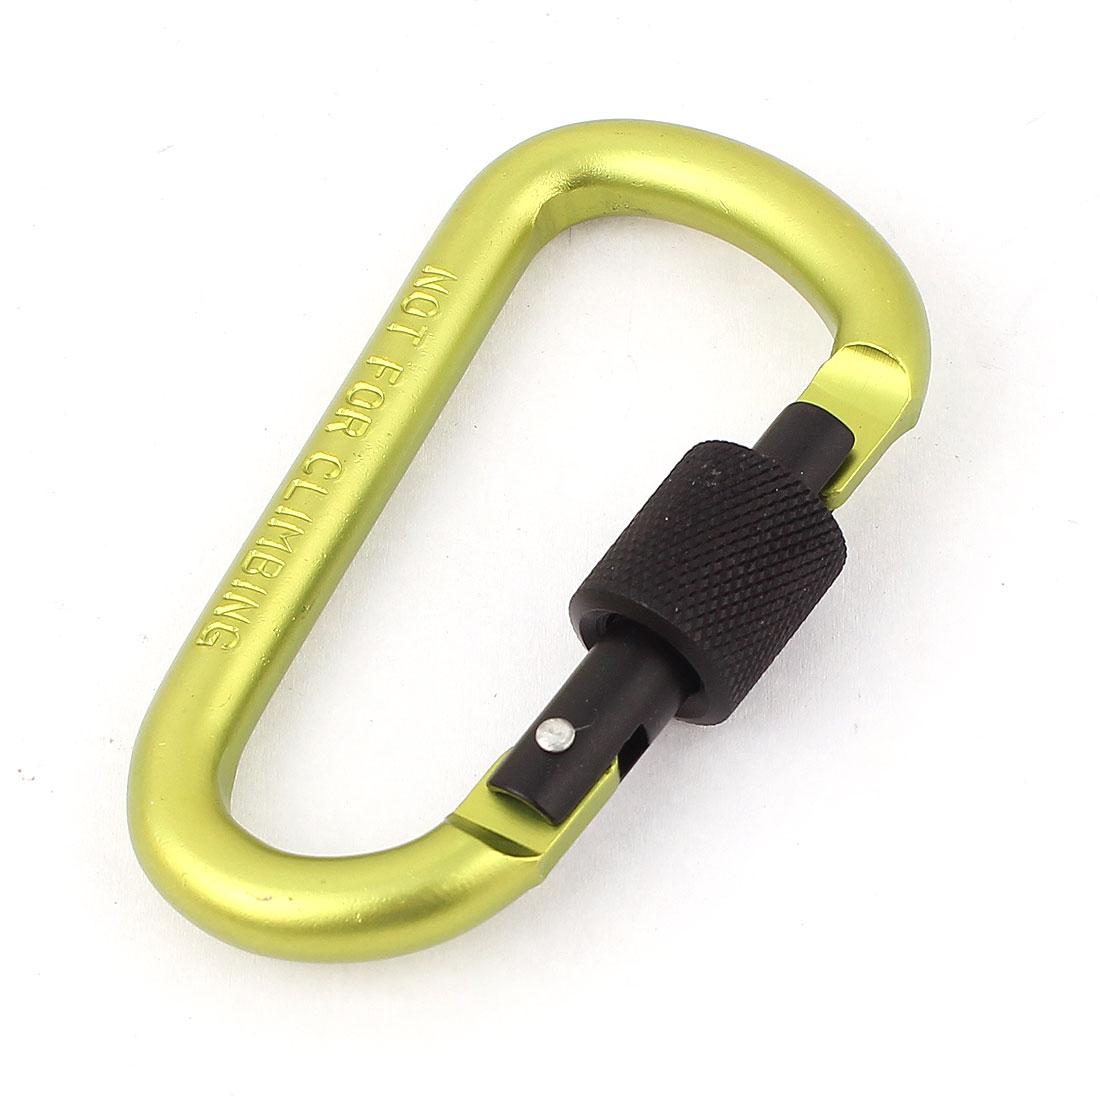 Spring Loaded Screw Locking Snap Carabiner Hook Clip Key Carrier Green